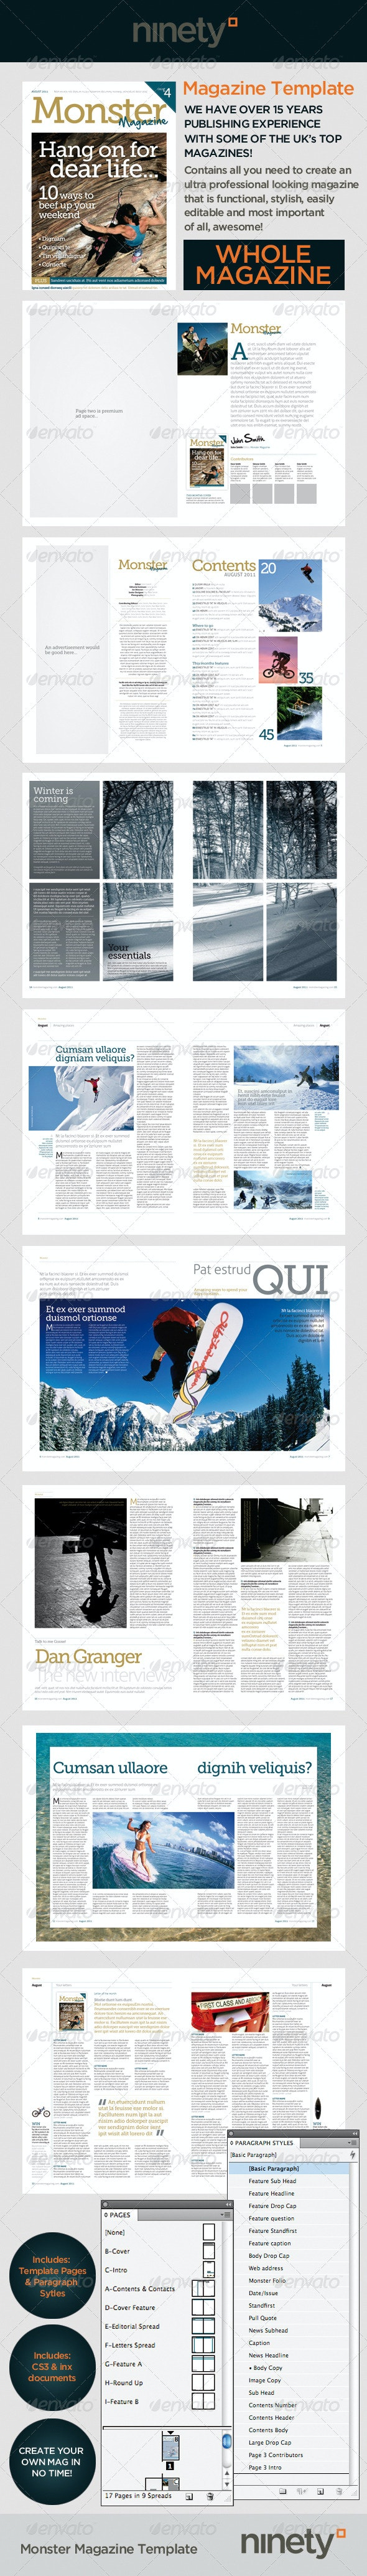 Monster Magazine Template - Magazines Print Templates